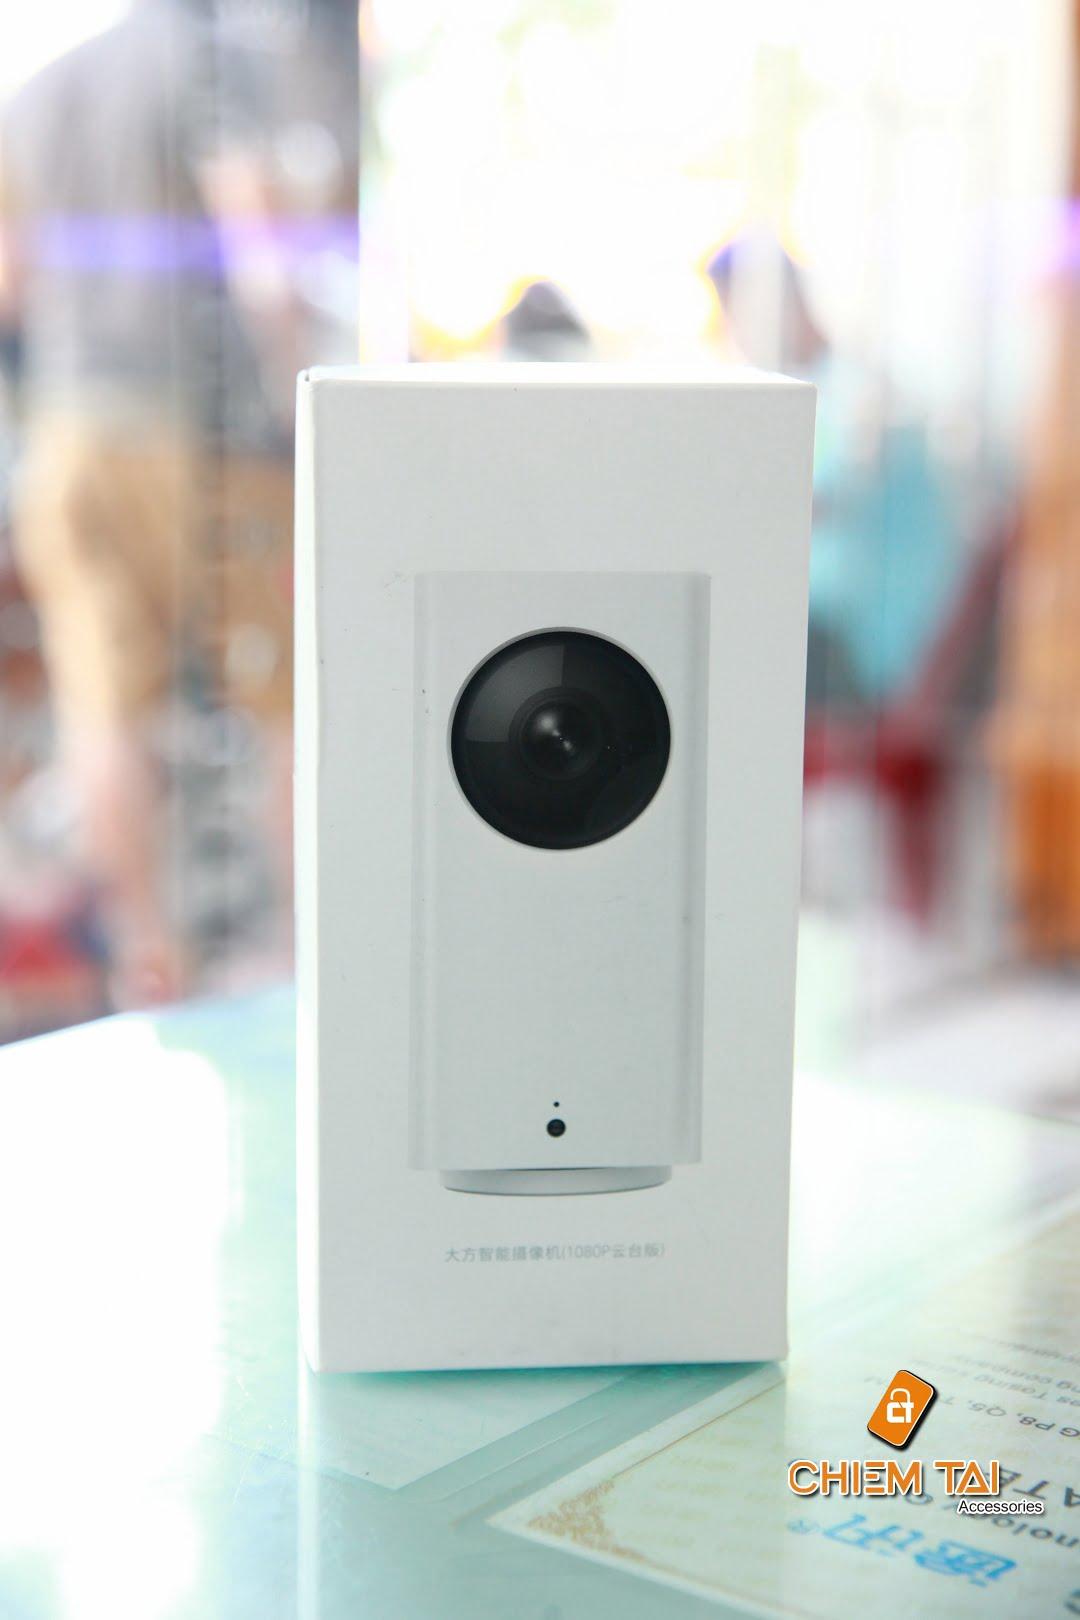 camera ip xiaomi xiaofang square ptz 360 full hd 1080p 6007d44ac36cd